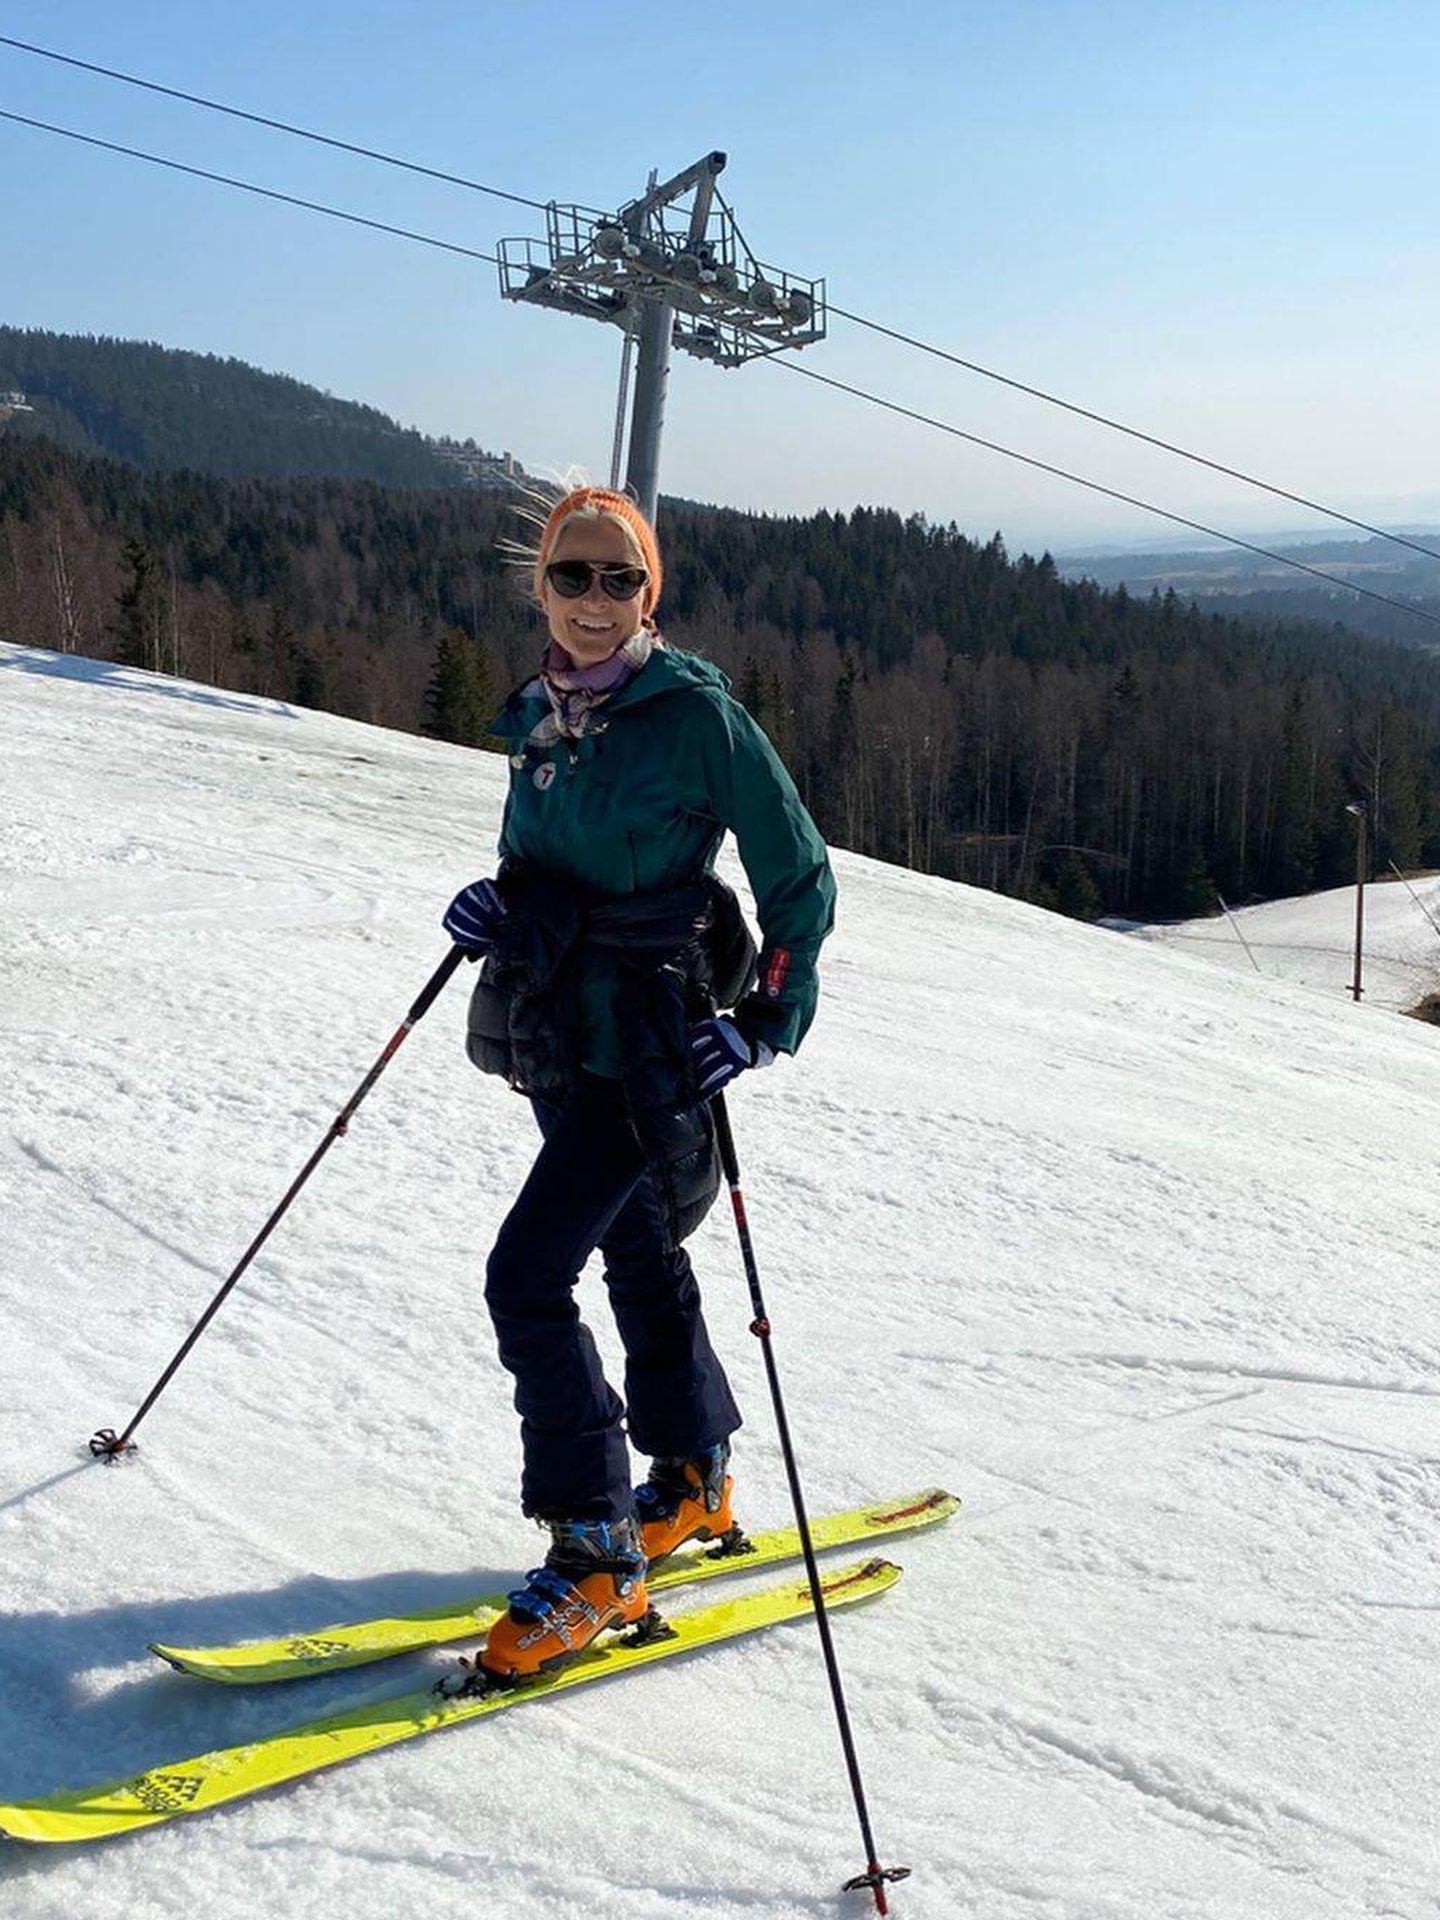 Mette-Marit, esquiando. (@crownprincessmm)